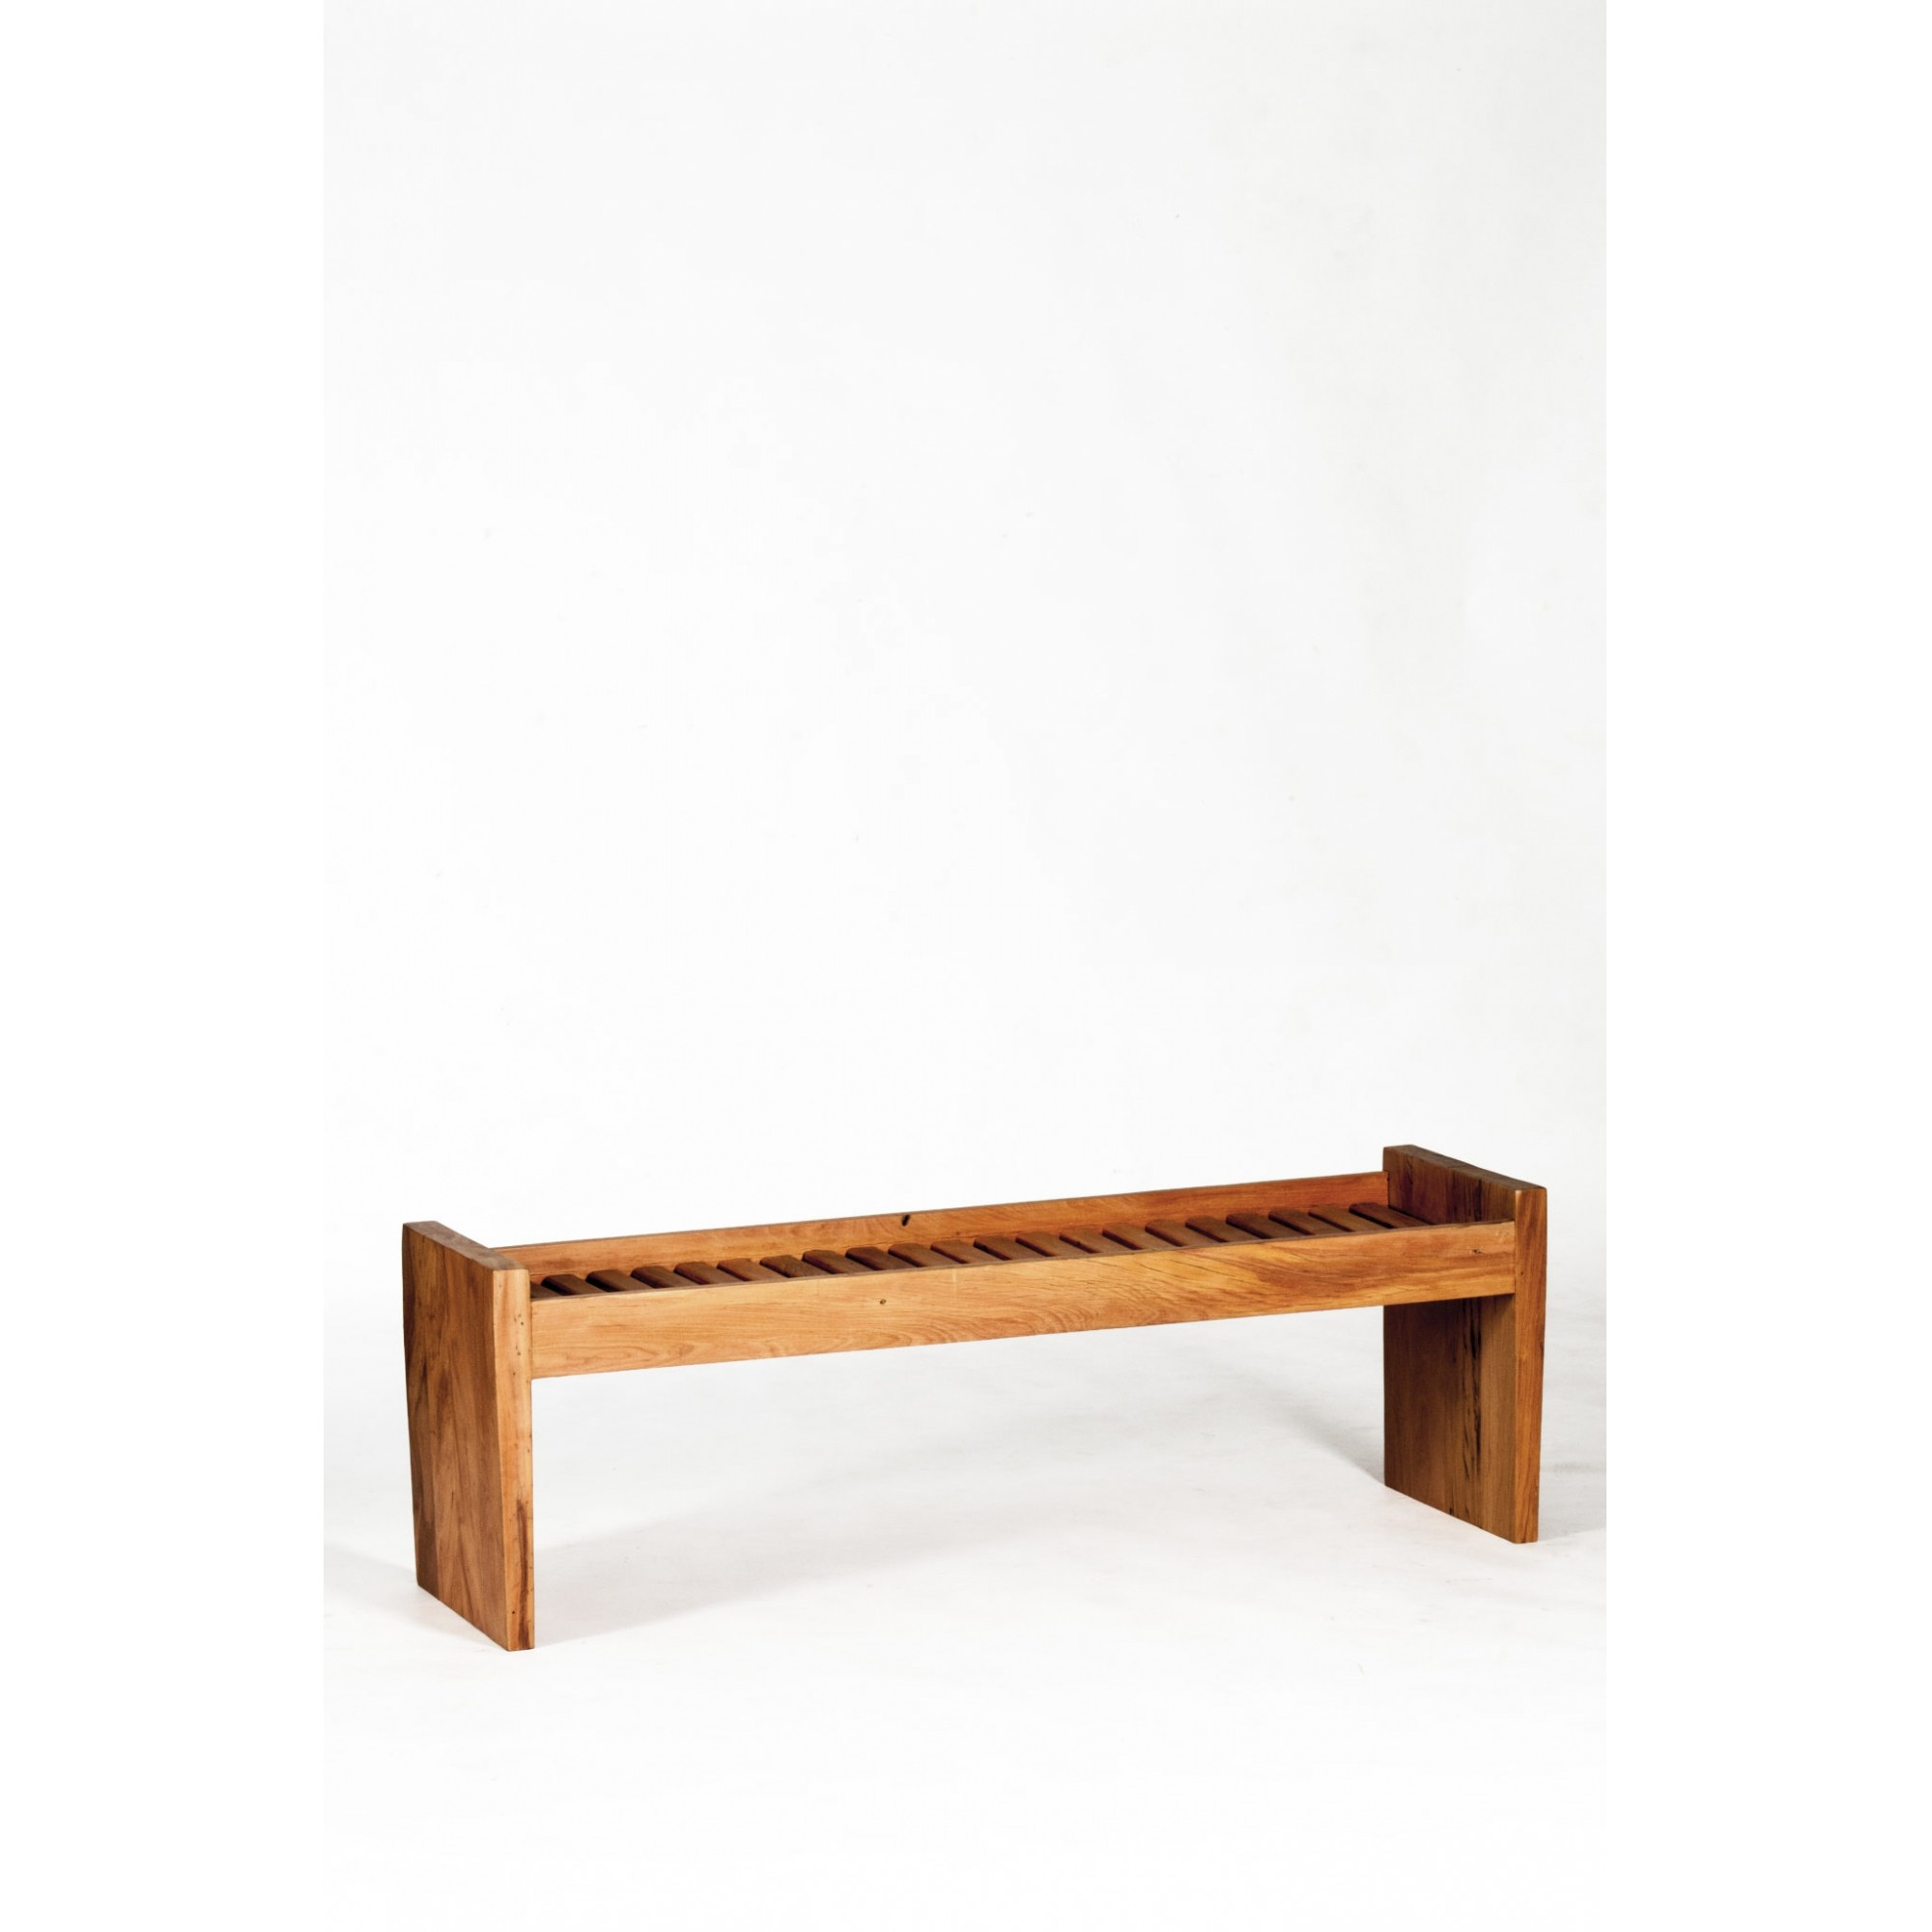 Banco futon